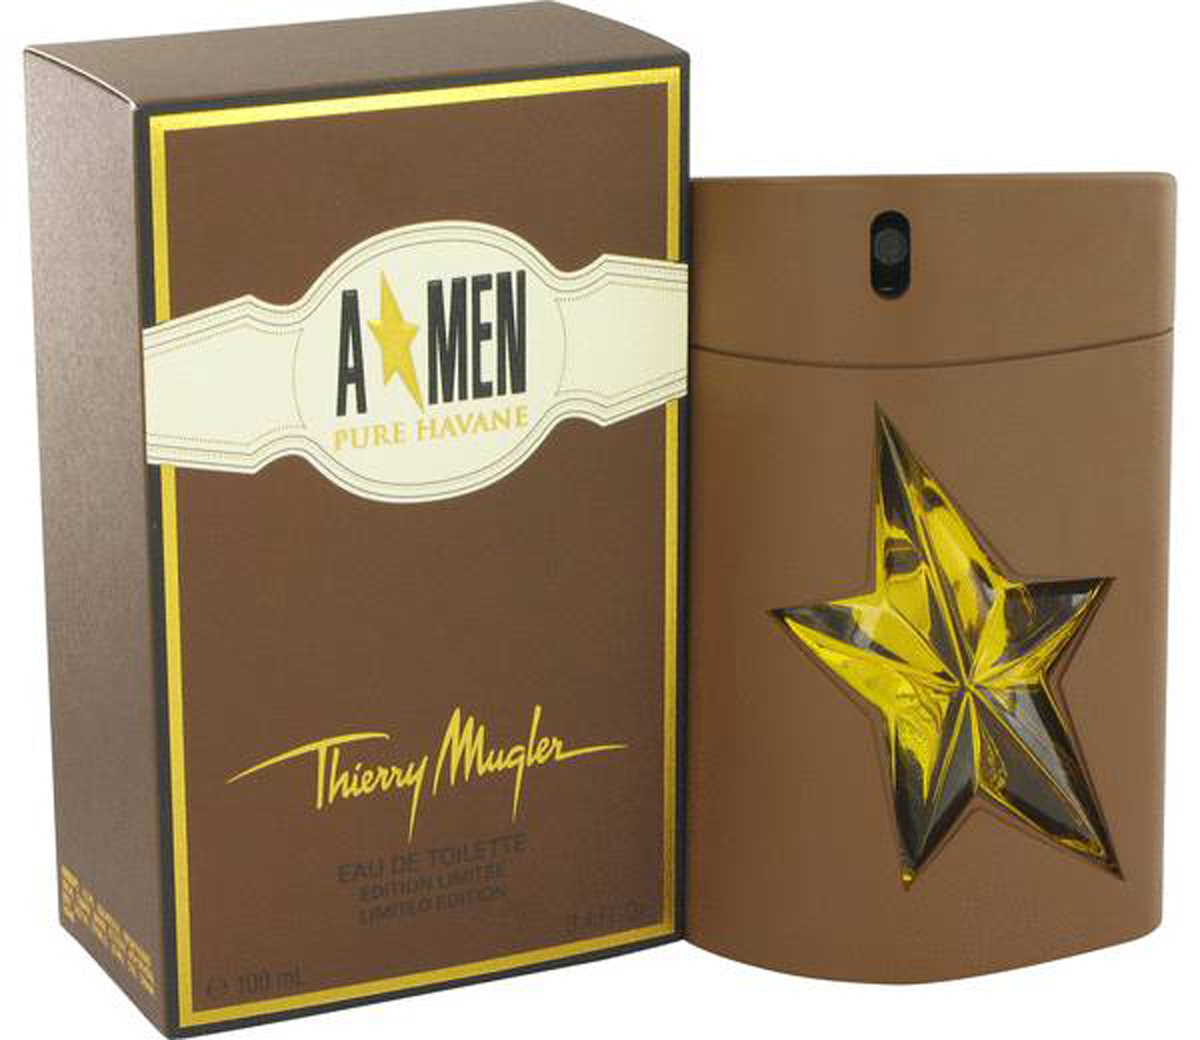 Thierry Mugler Туалетная вода A*Men Pure Havane, мужская, 100 мл13974Ванильные, восточные. Ваниль, какао, пачули, амбра, лабданум, стиракс, мед, табак.